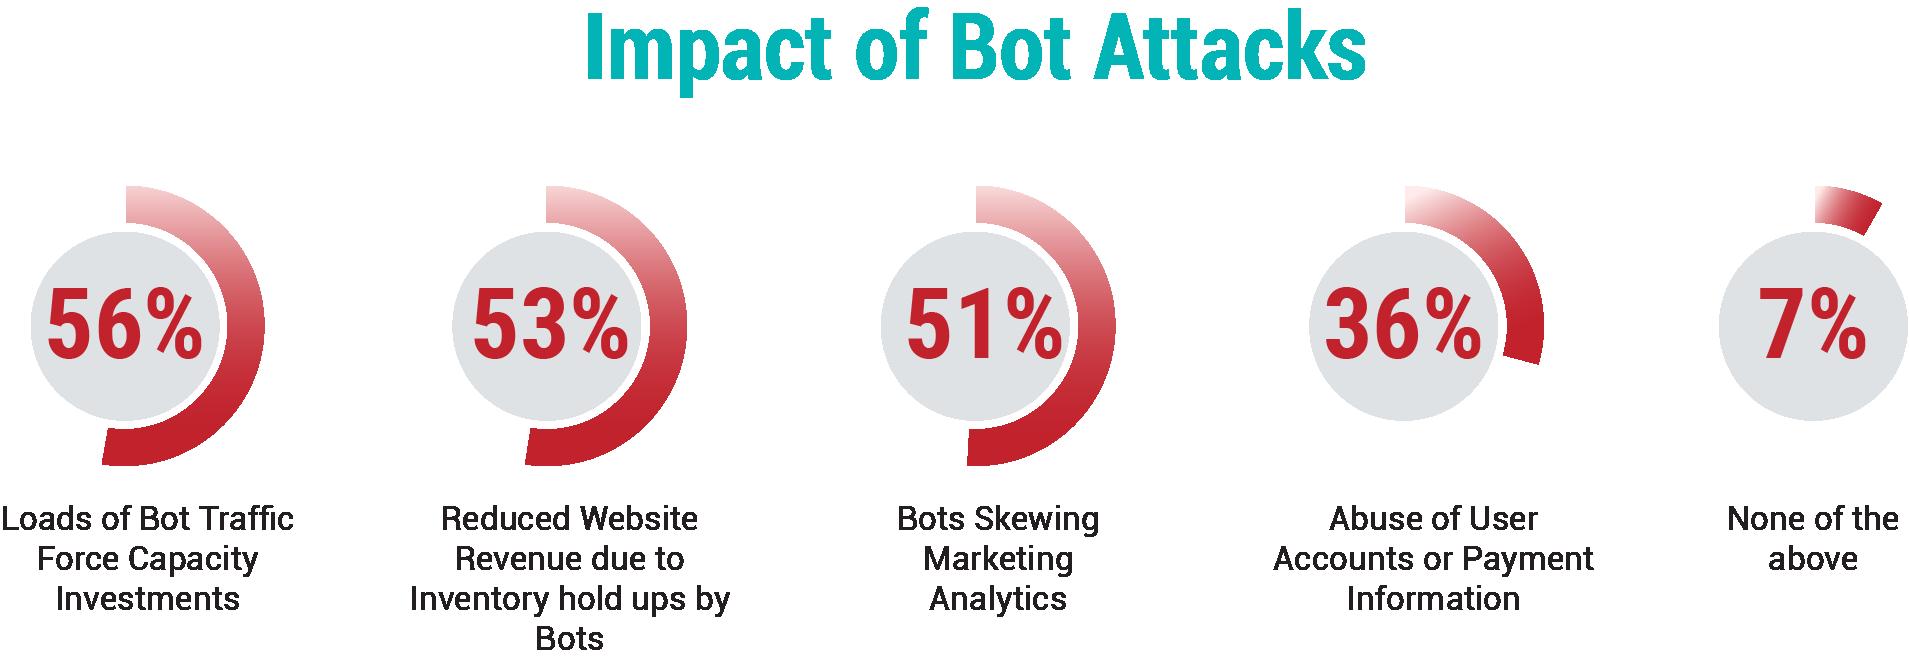 Impact-of-Bot-Attacks